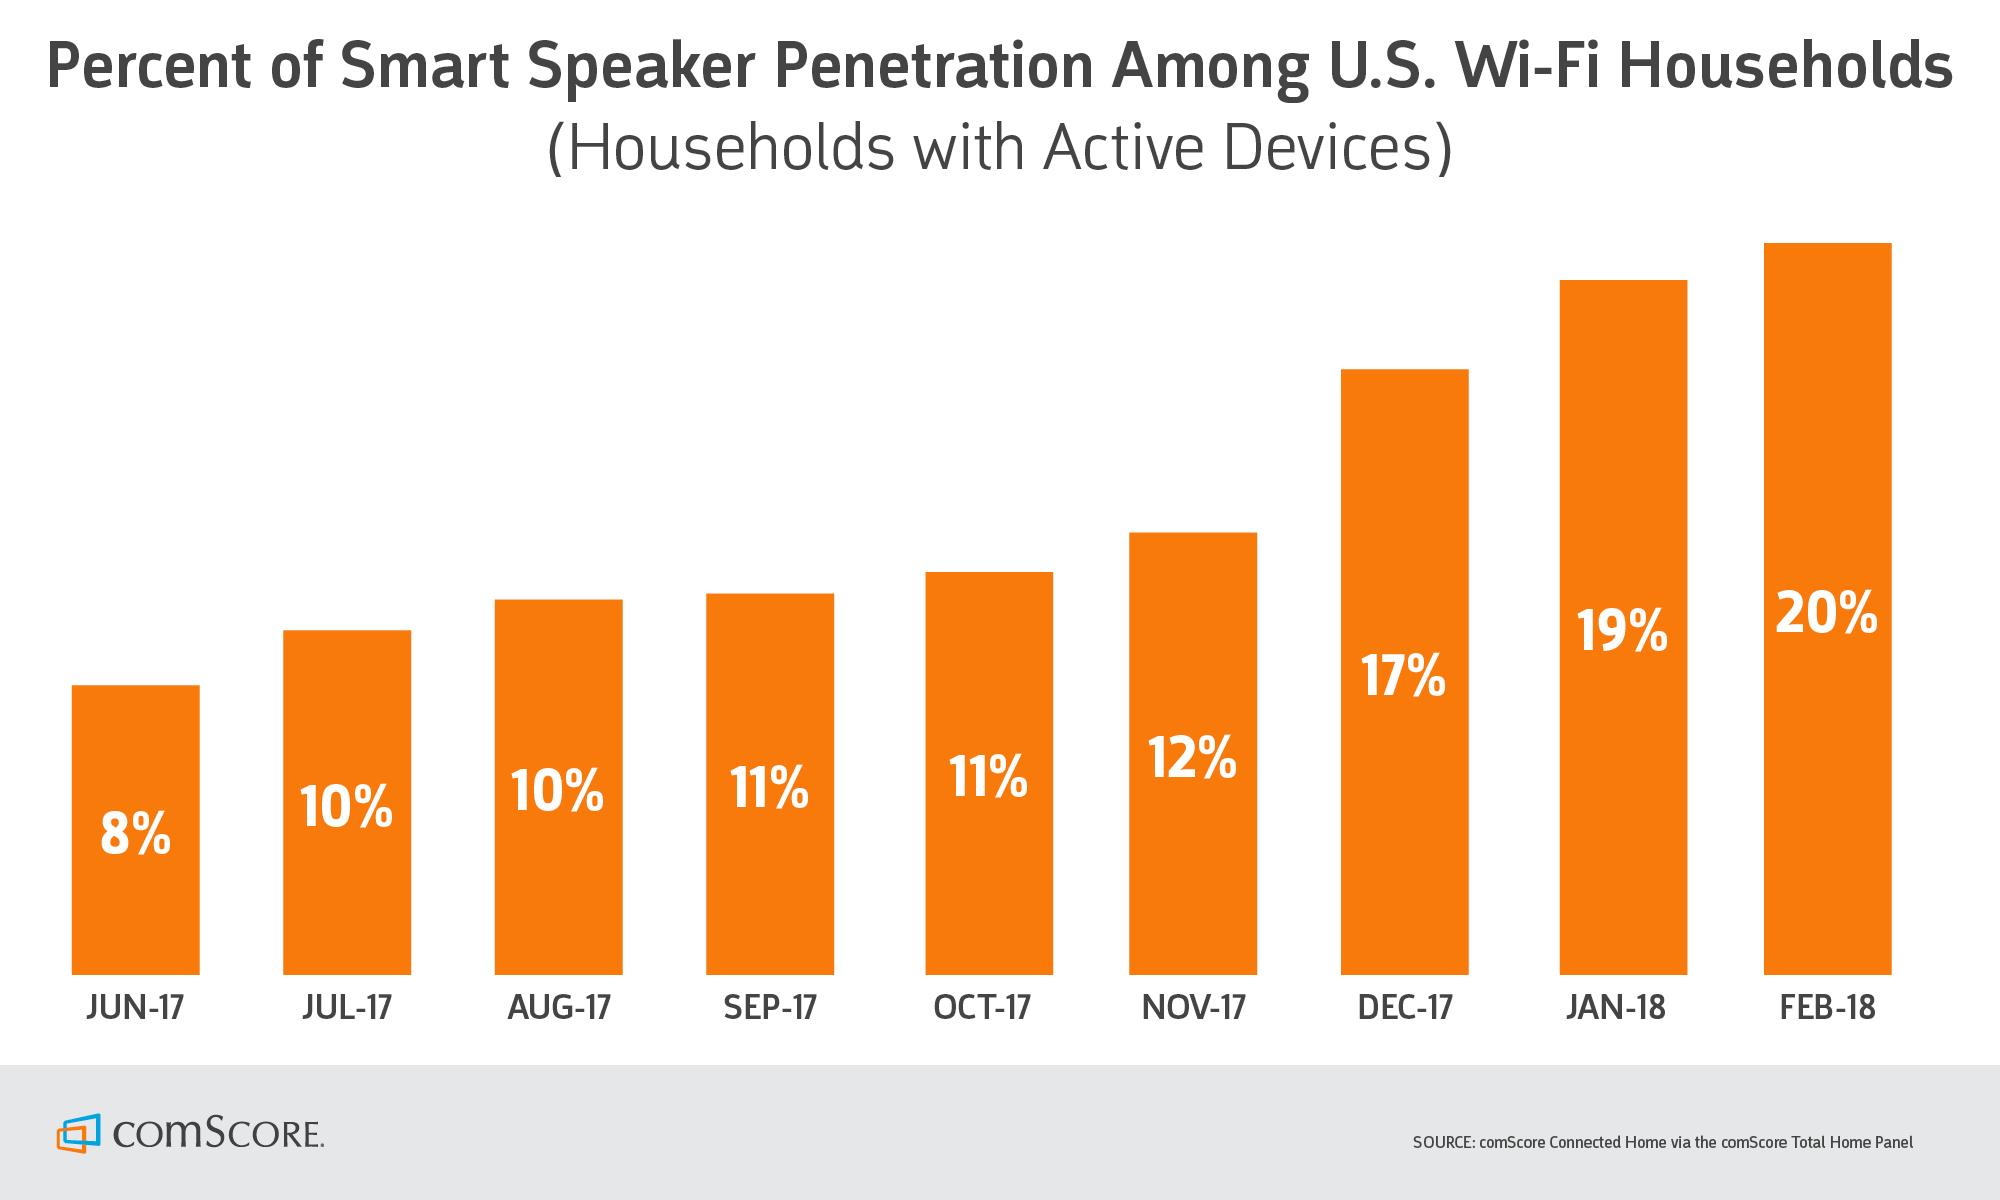 Home wifi penetration